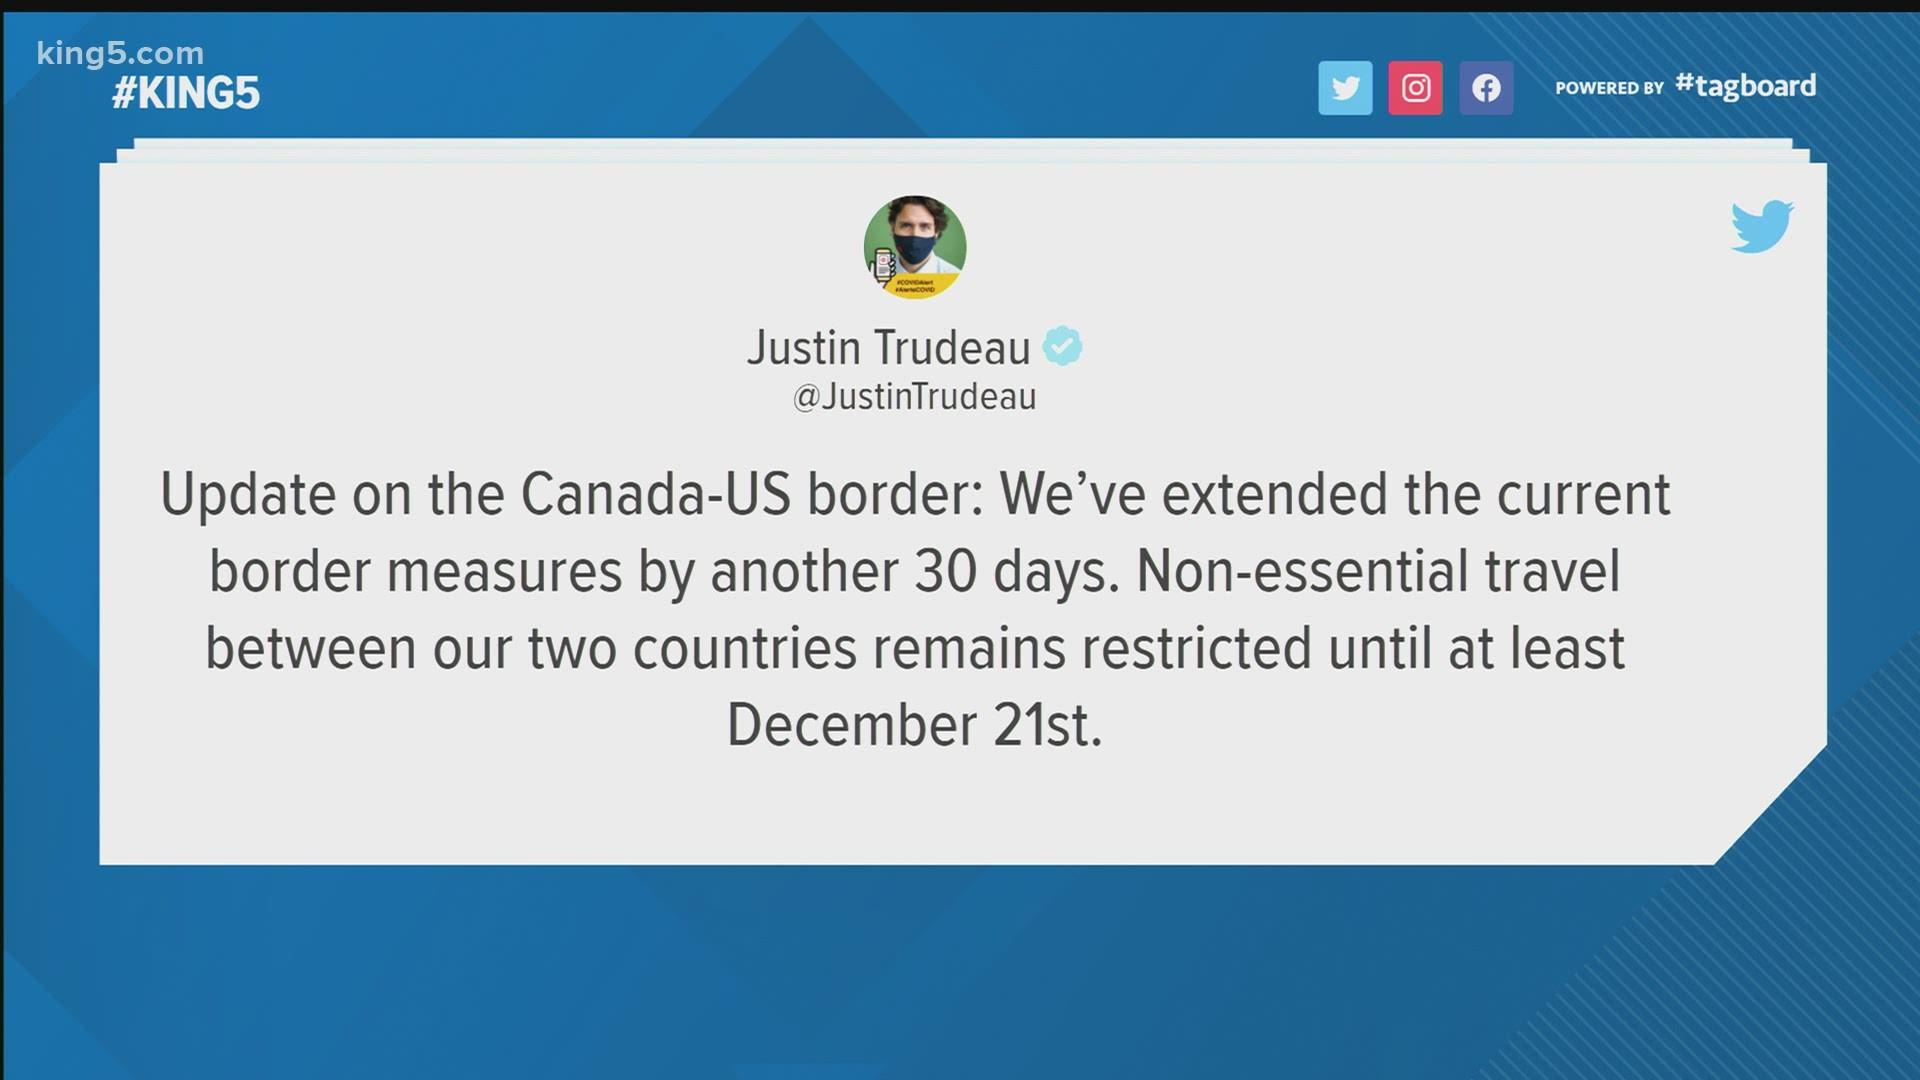 U S Canada Border To Stay Closed Through December 21 Trudeau Announces King5 Com